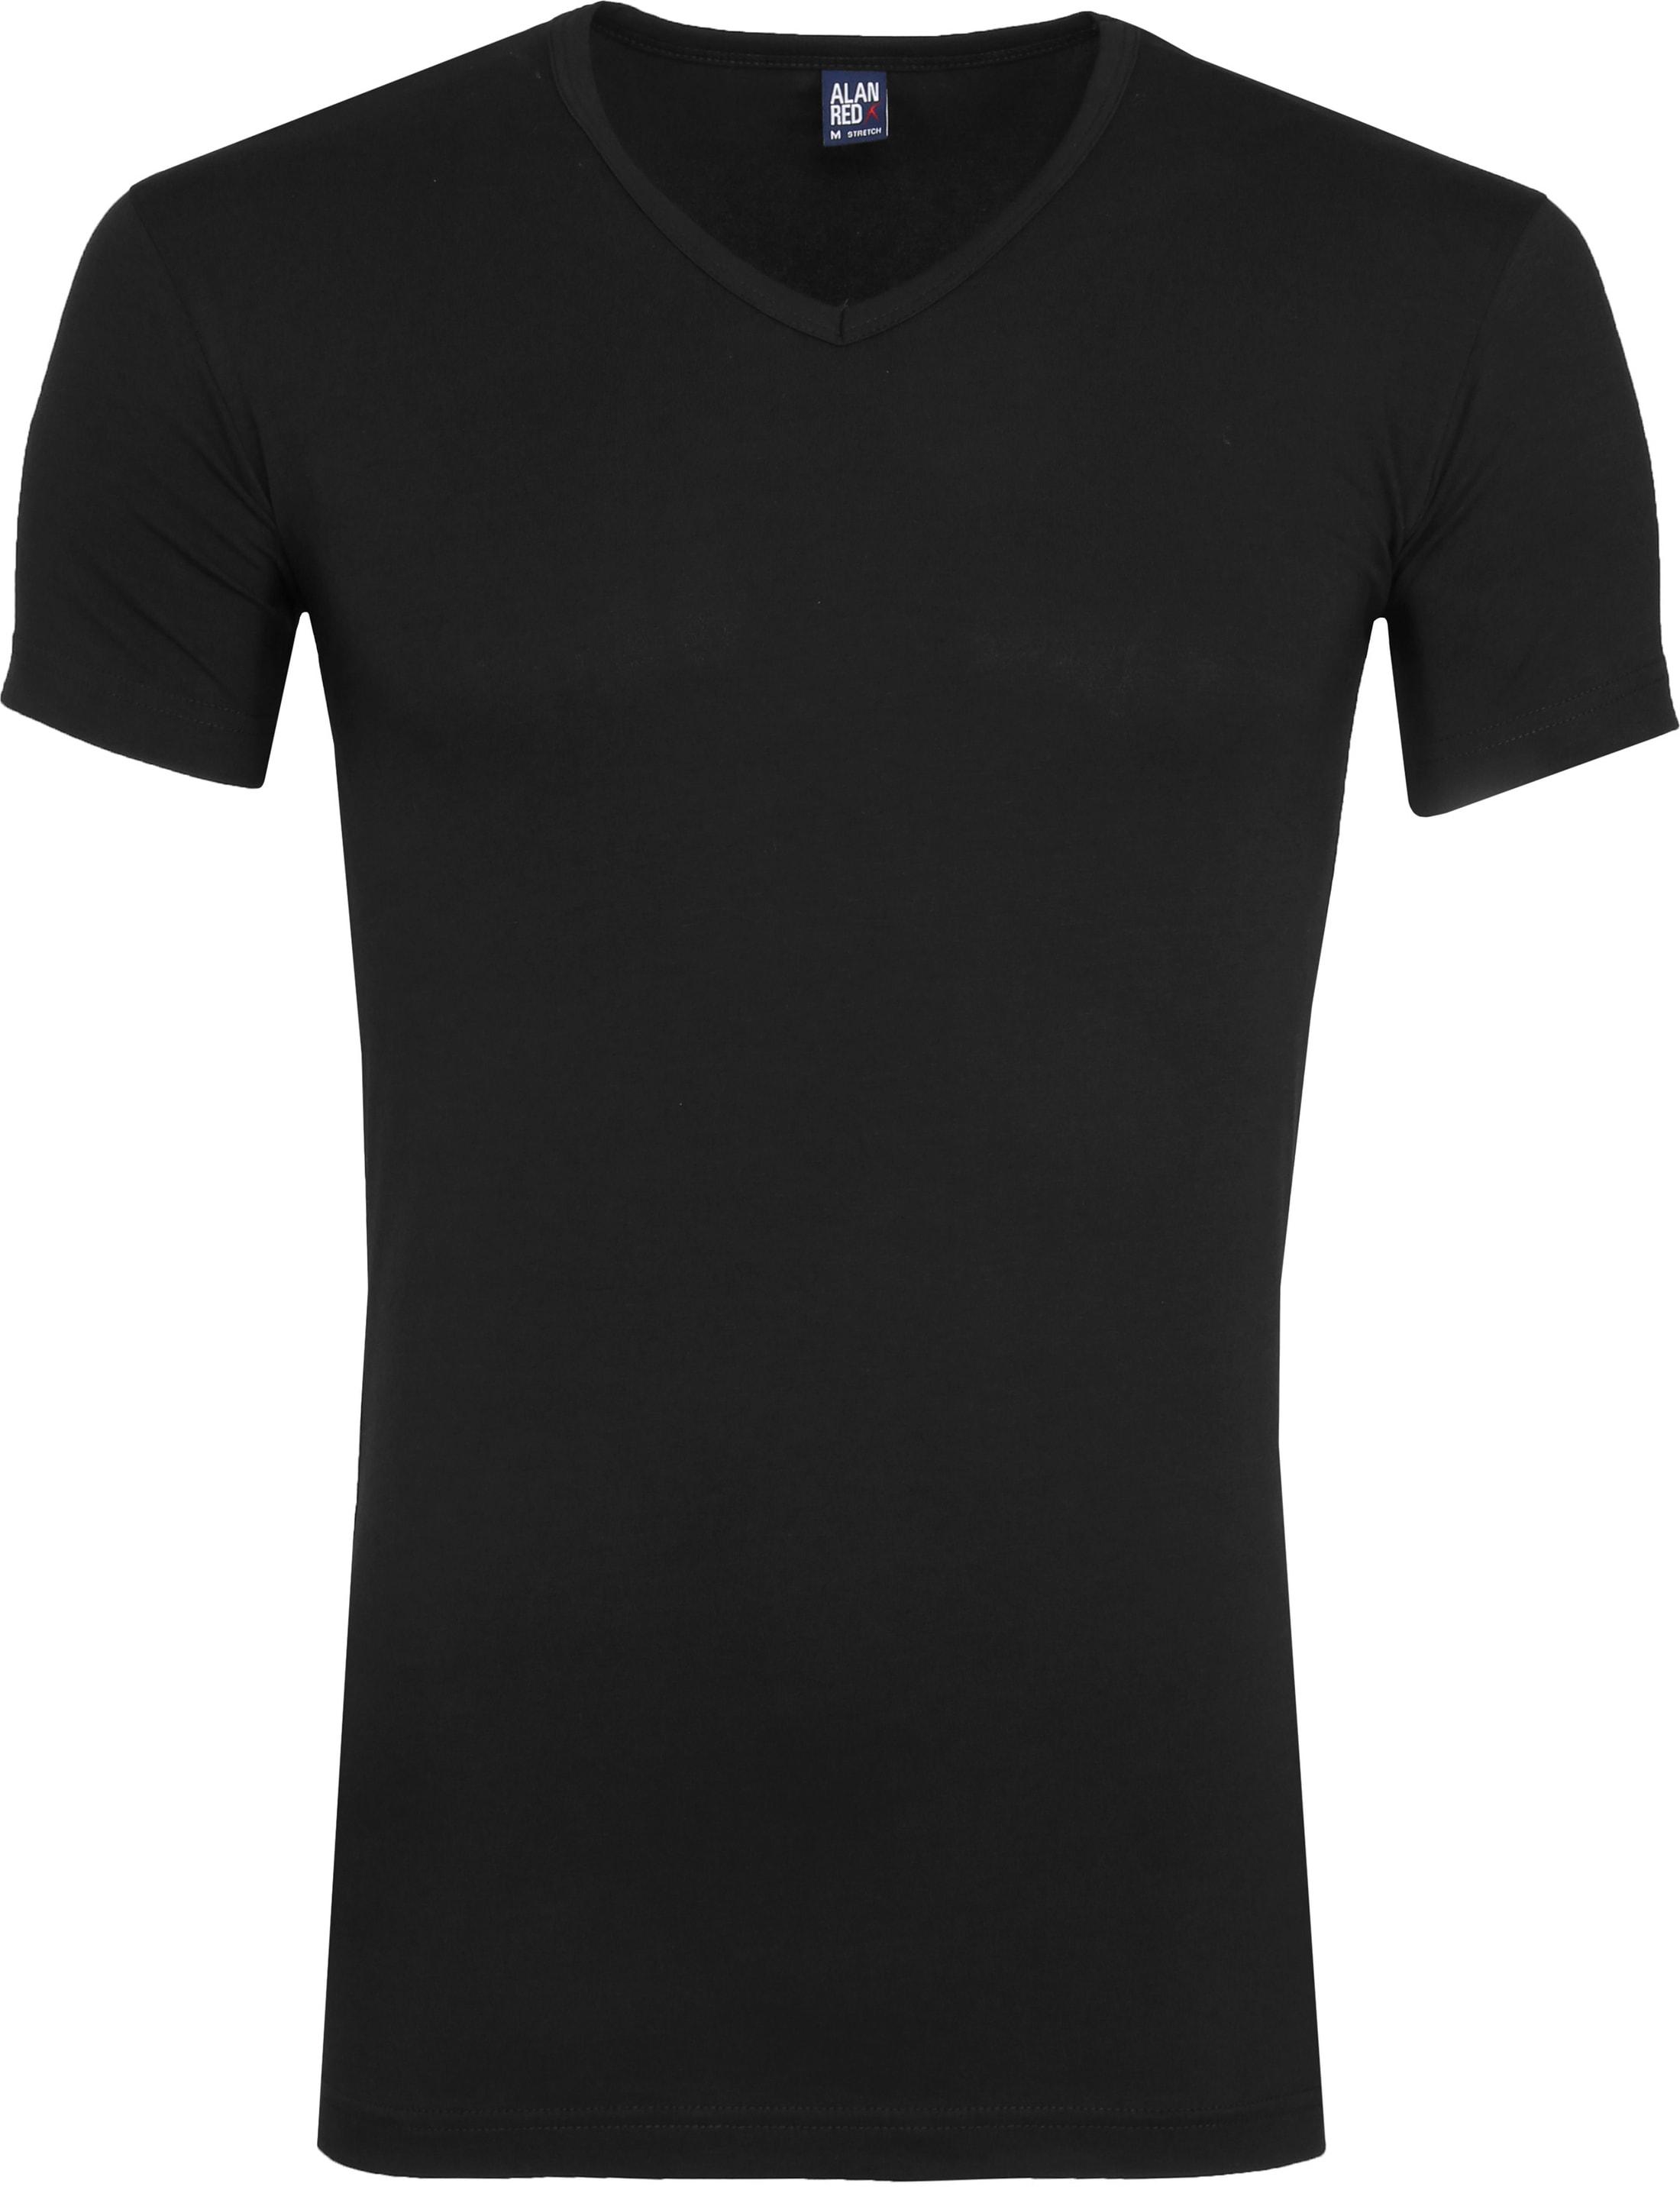 Alan Red Oklahoma Stretch T-Shirt Schwarz (2er-Pack) Foto 1